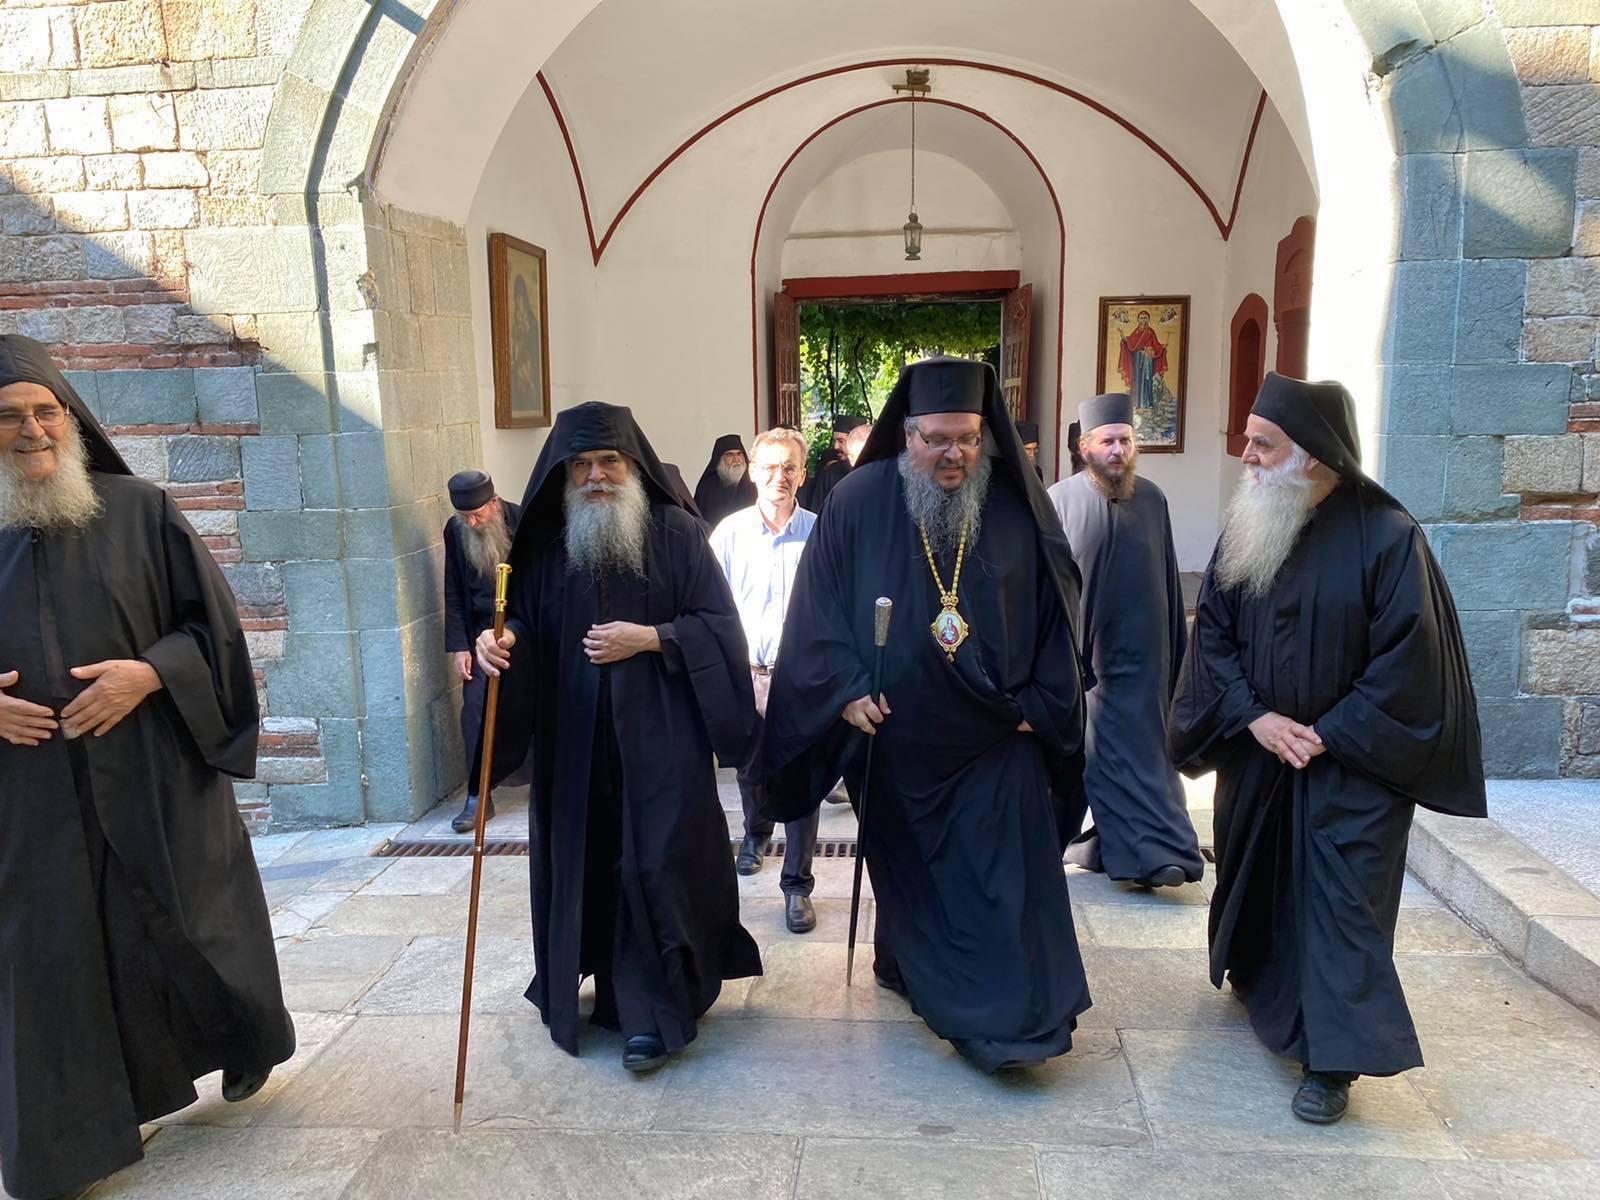 grigoriou 2020 4 - Στην Ιερά Μονή του Οσίου Γρηγορίου ο Ποιμενάρχης μας (φωτ)